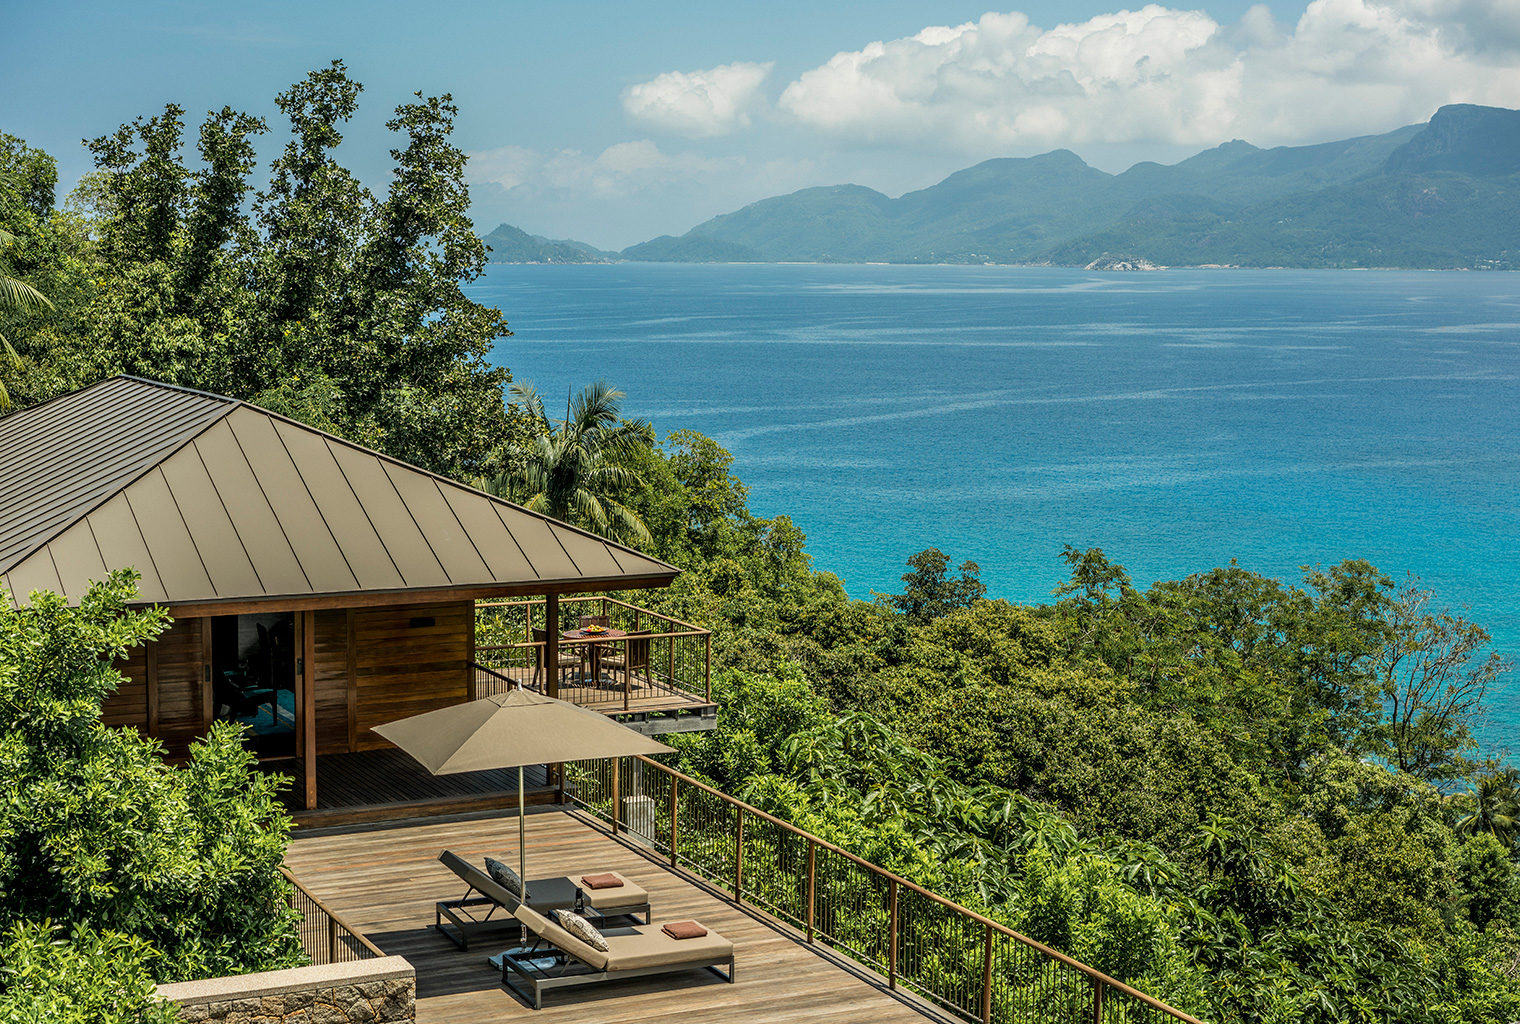 Four-Seasons-Seychelles-Balcony-Deck